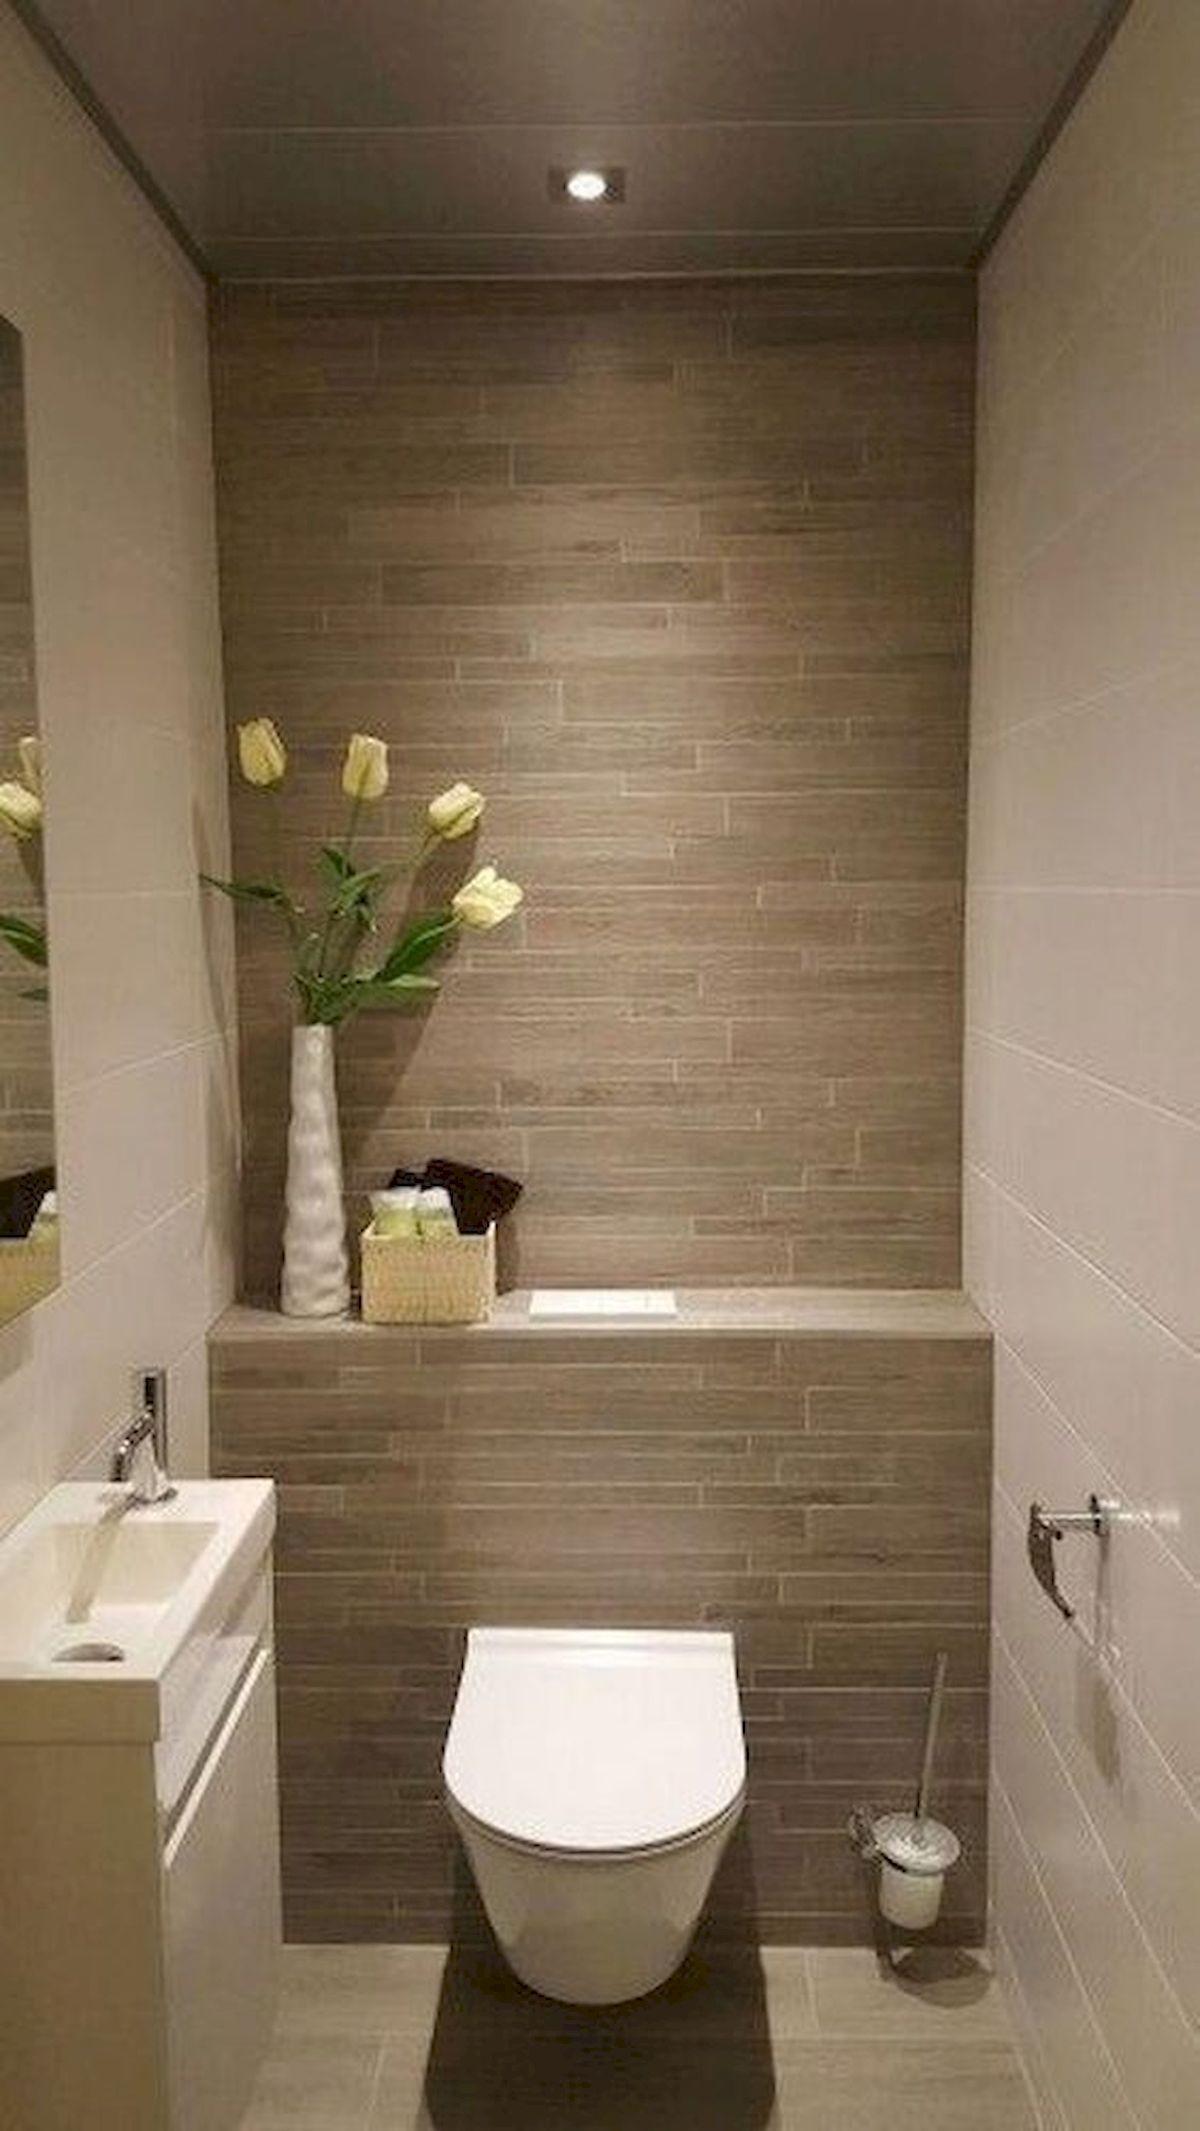 50 Cozy Bathroom Design Ideas For Small